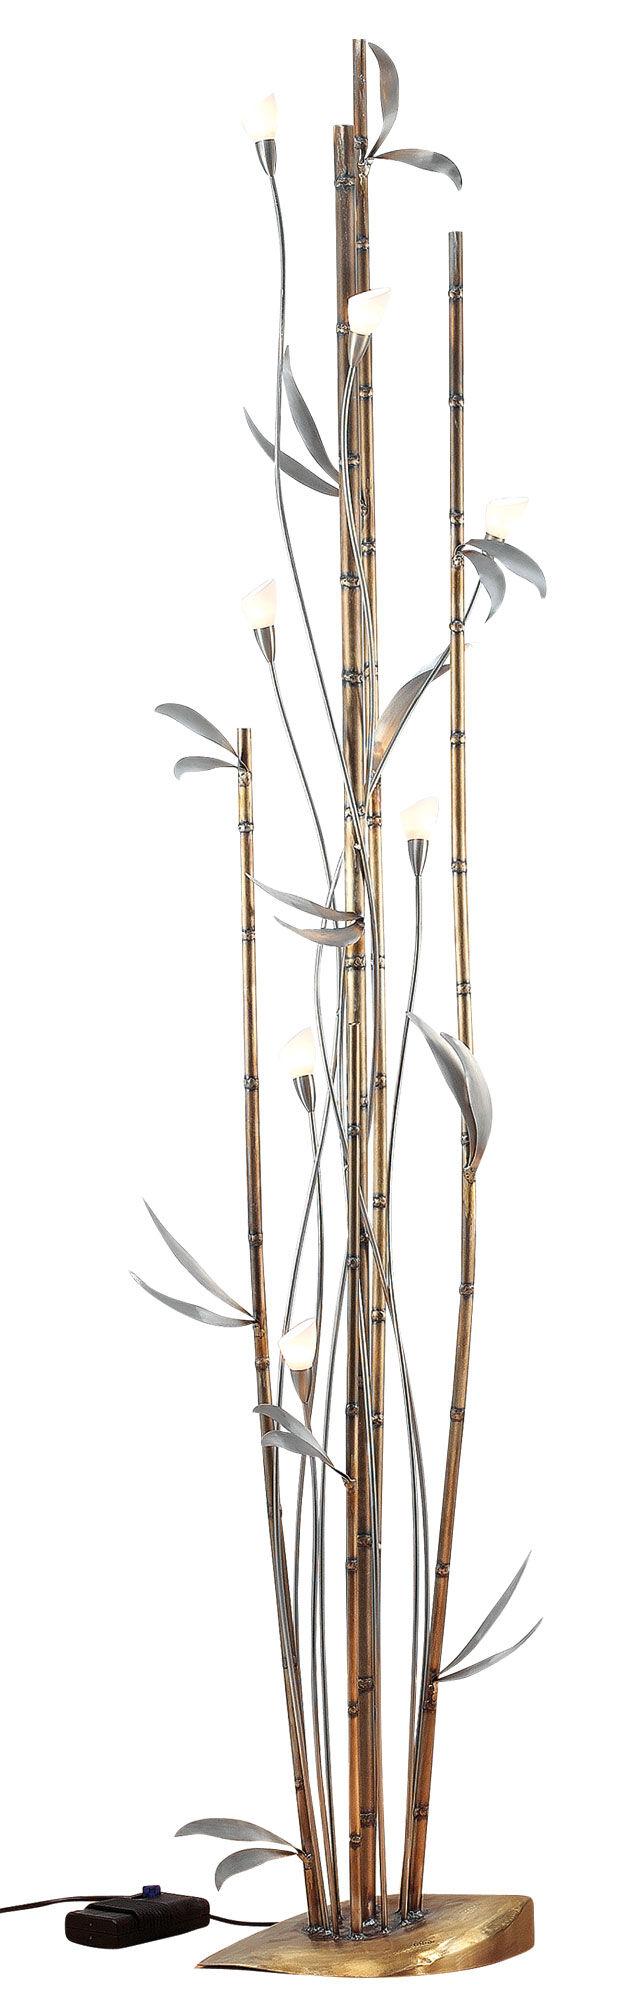 sabine b ttger hopfgartner deckenfluter bamboo dimmbar ars mundi. Black Bedroom Furniture Sets. Home Design Ideas